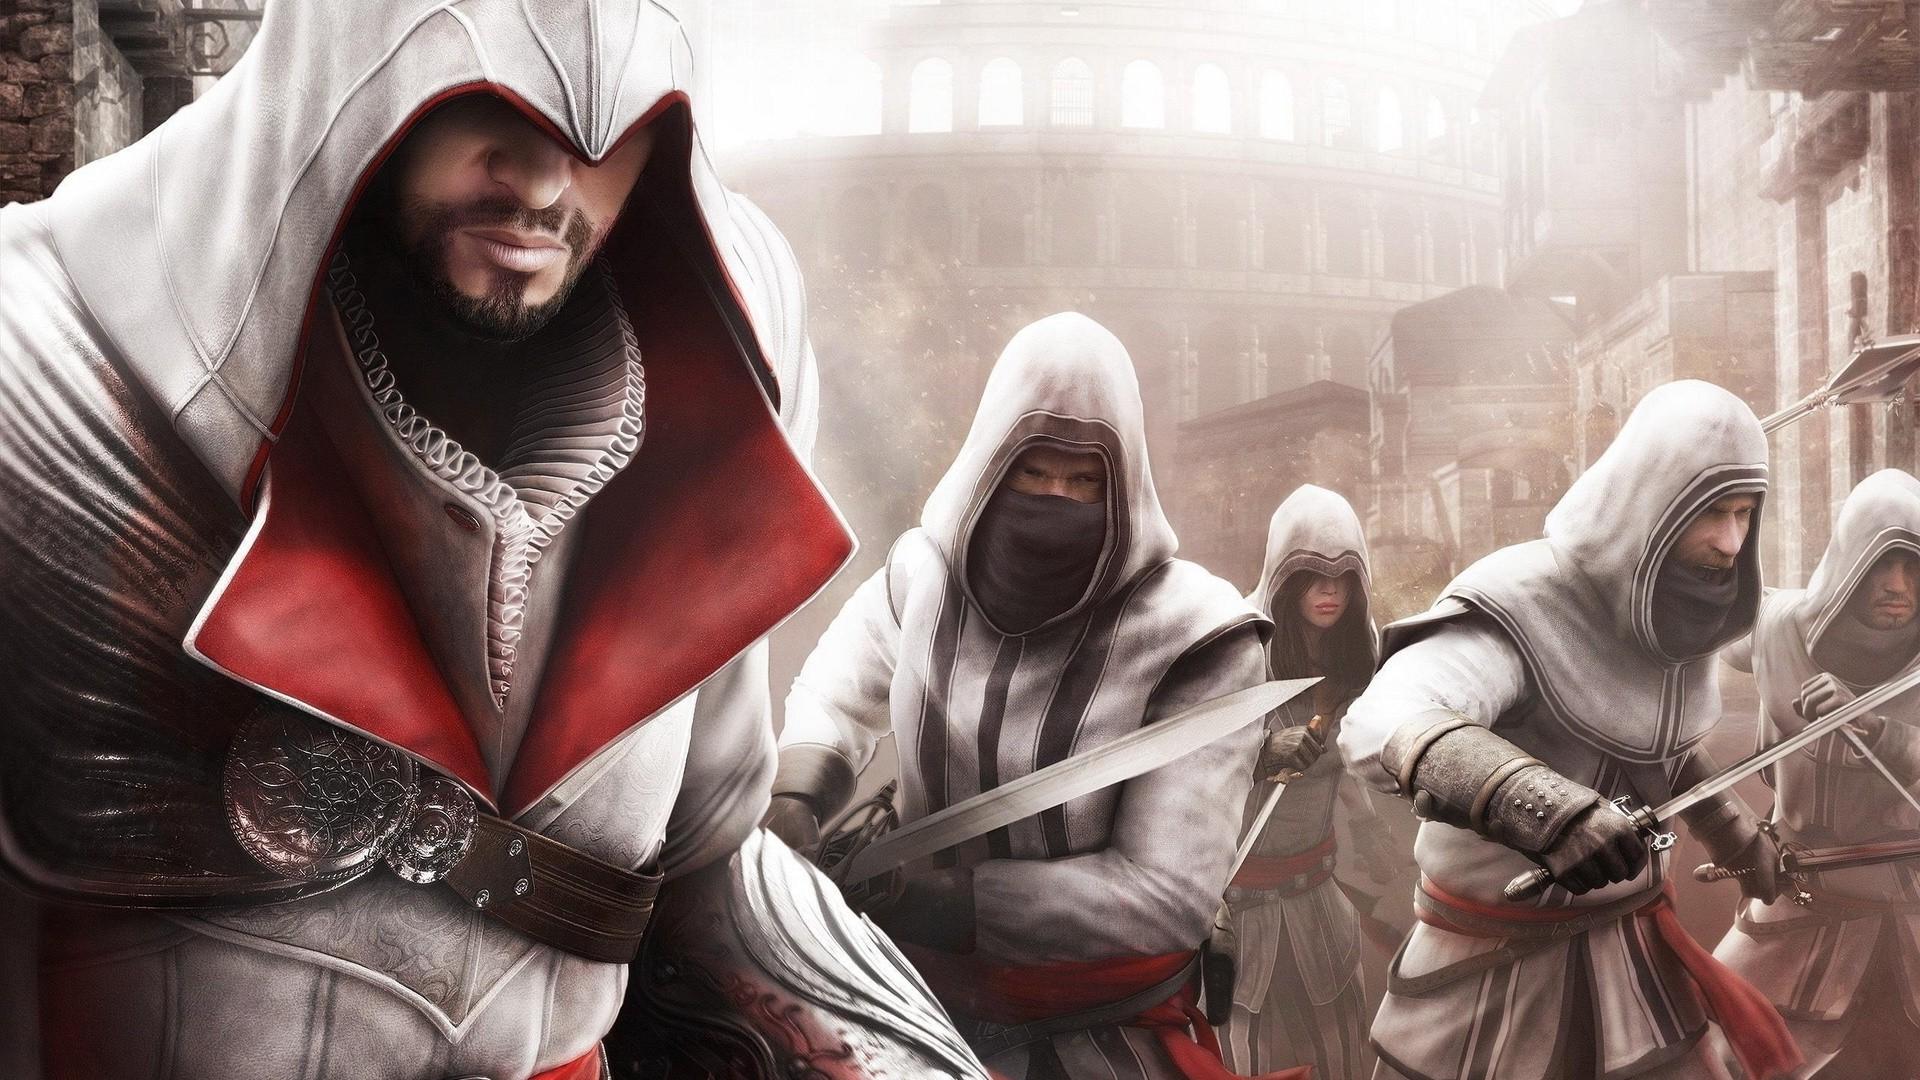 4. Assassin's Creed Brotherhood